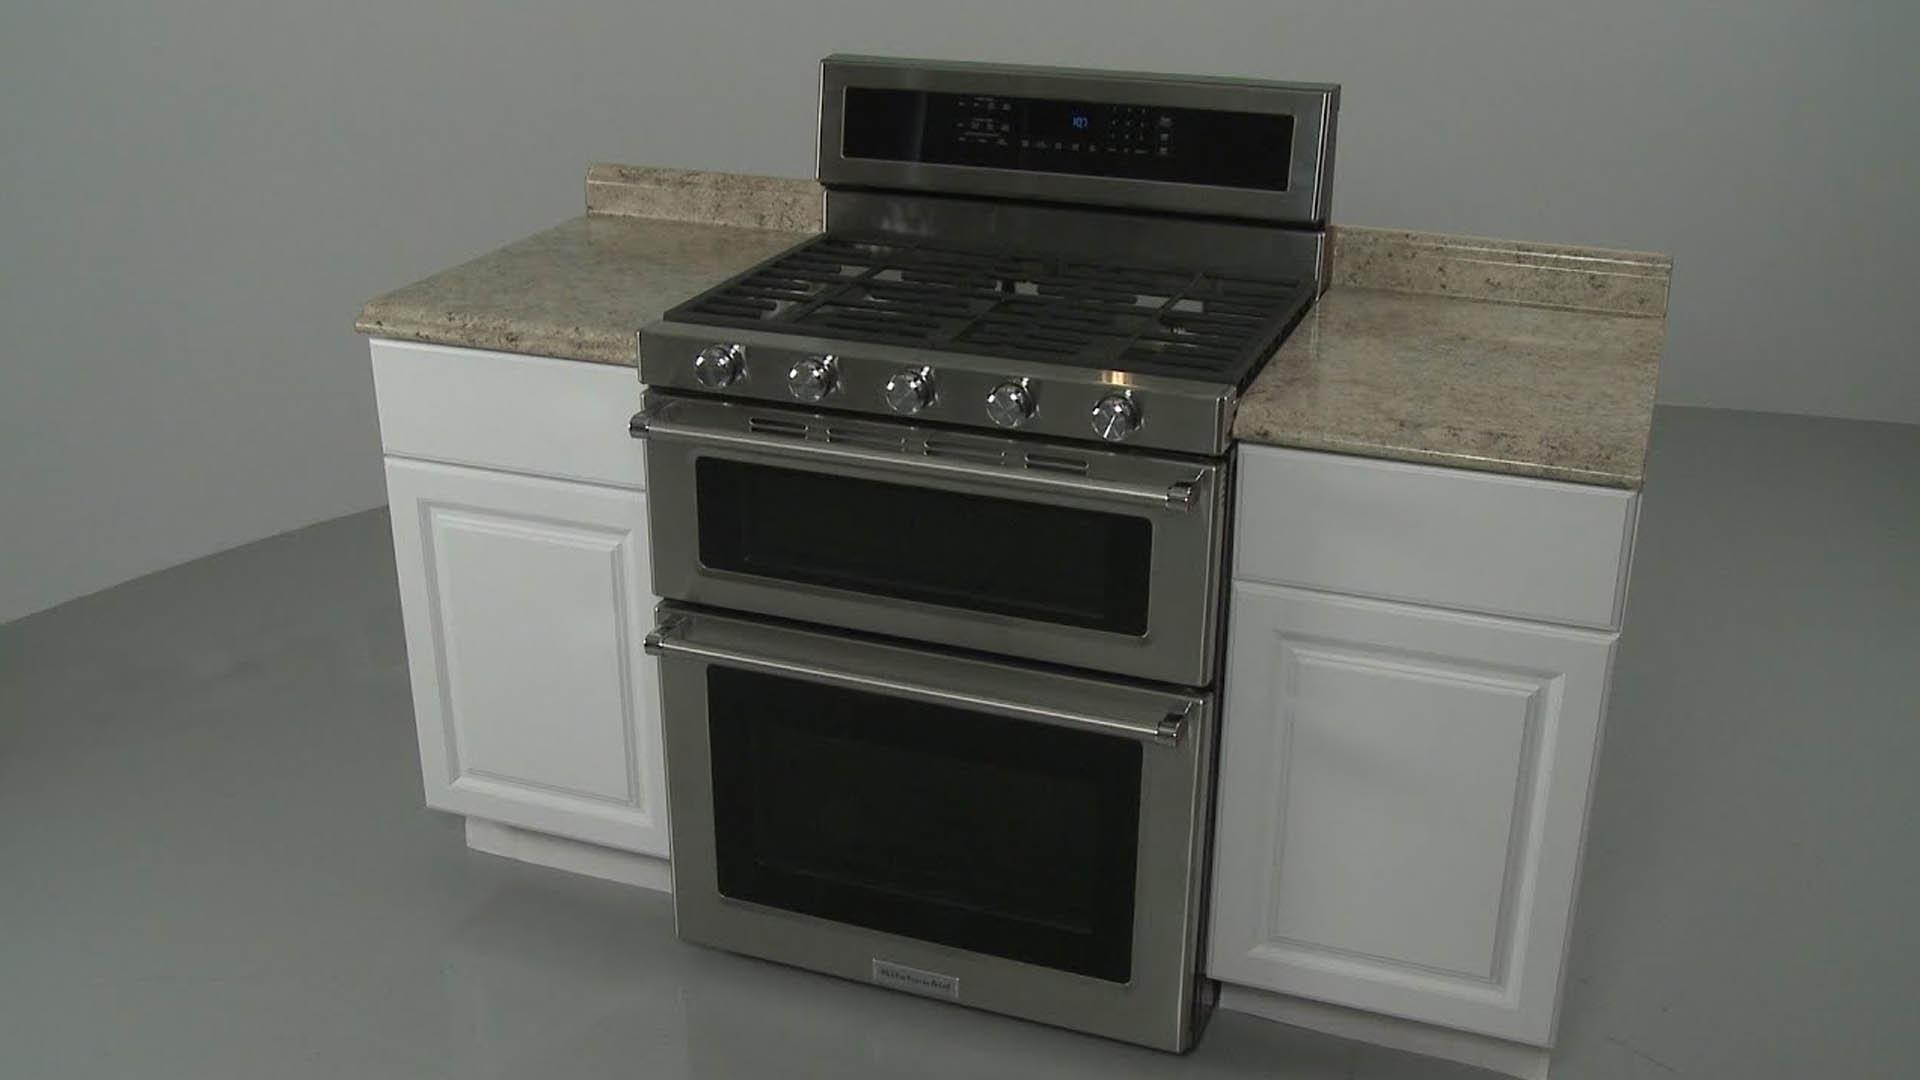 KitchenAid Double Oven Range Repair Service | KitchenAid Repairs